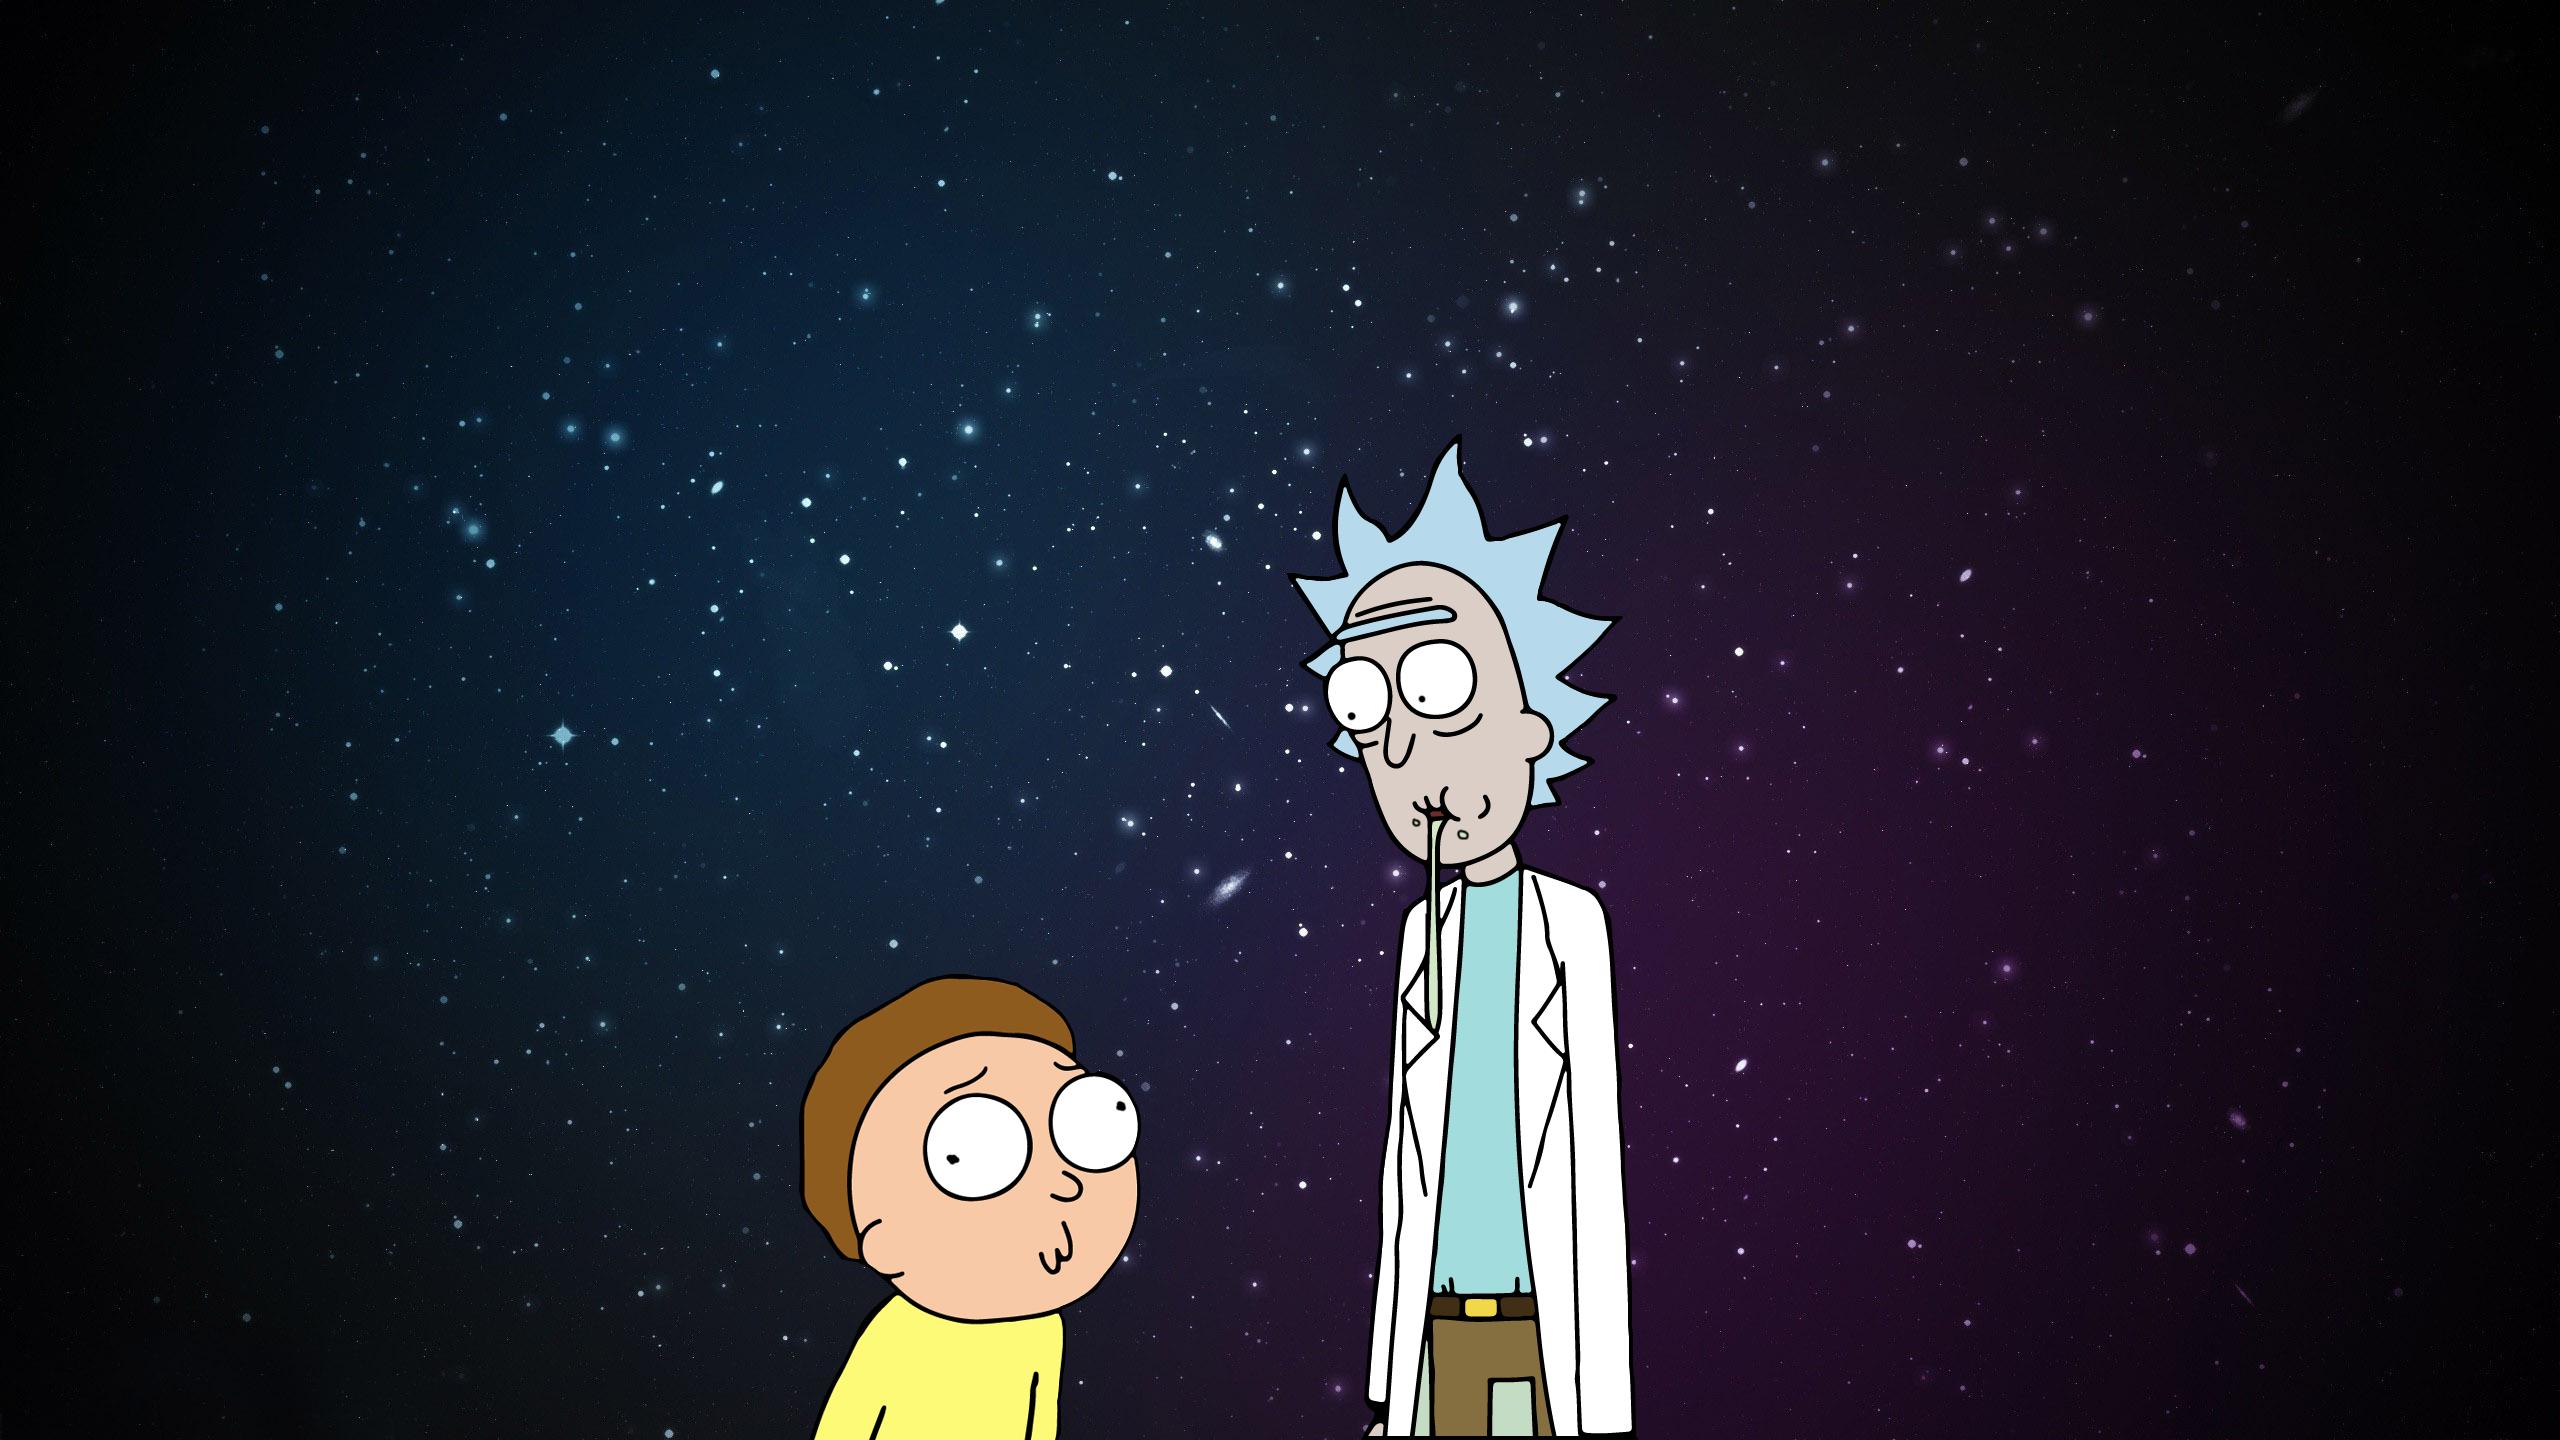 Rick And Morty Sad Wallpapers - Wallpaper Cave